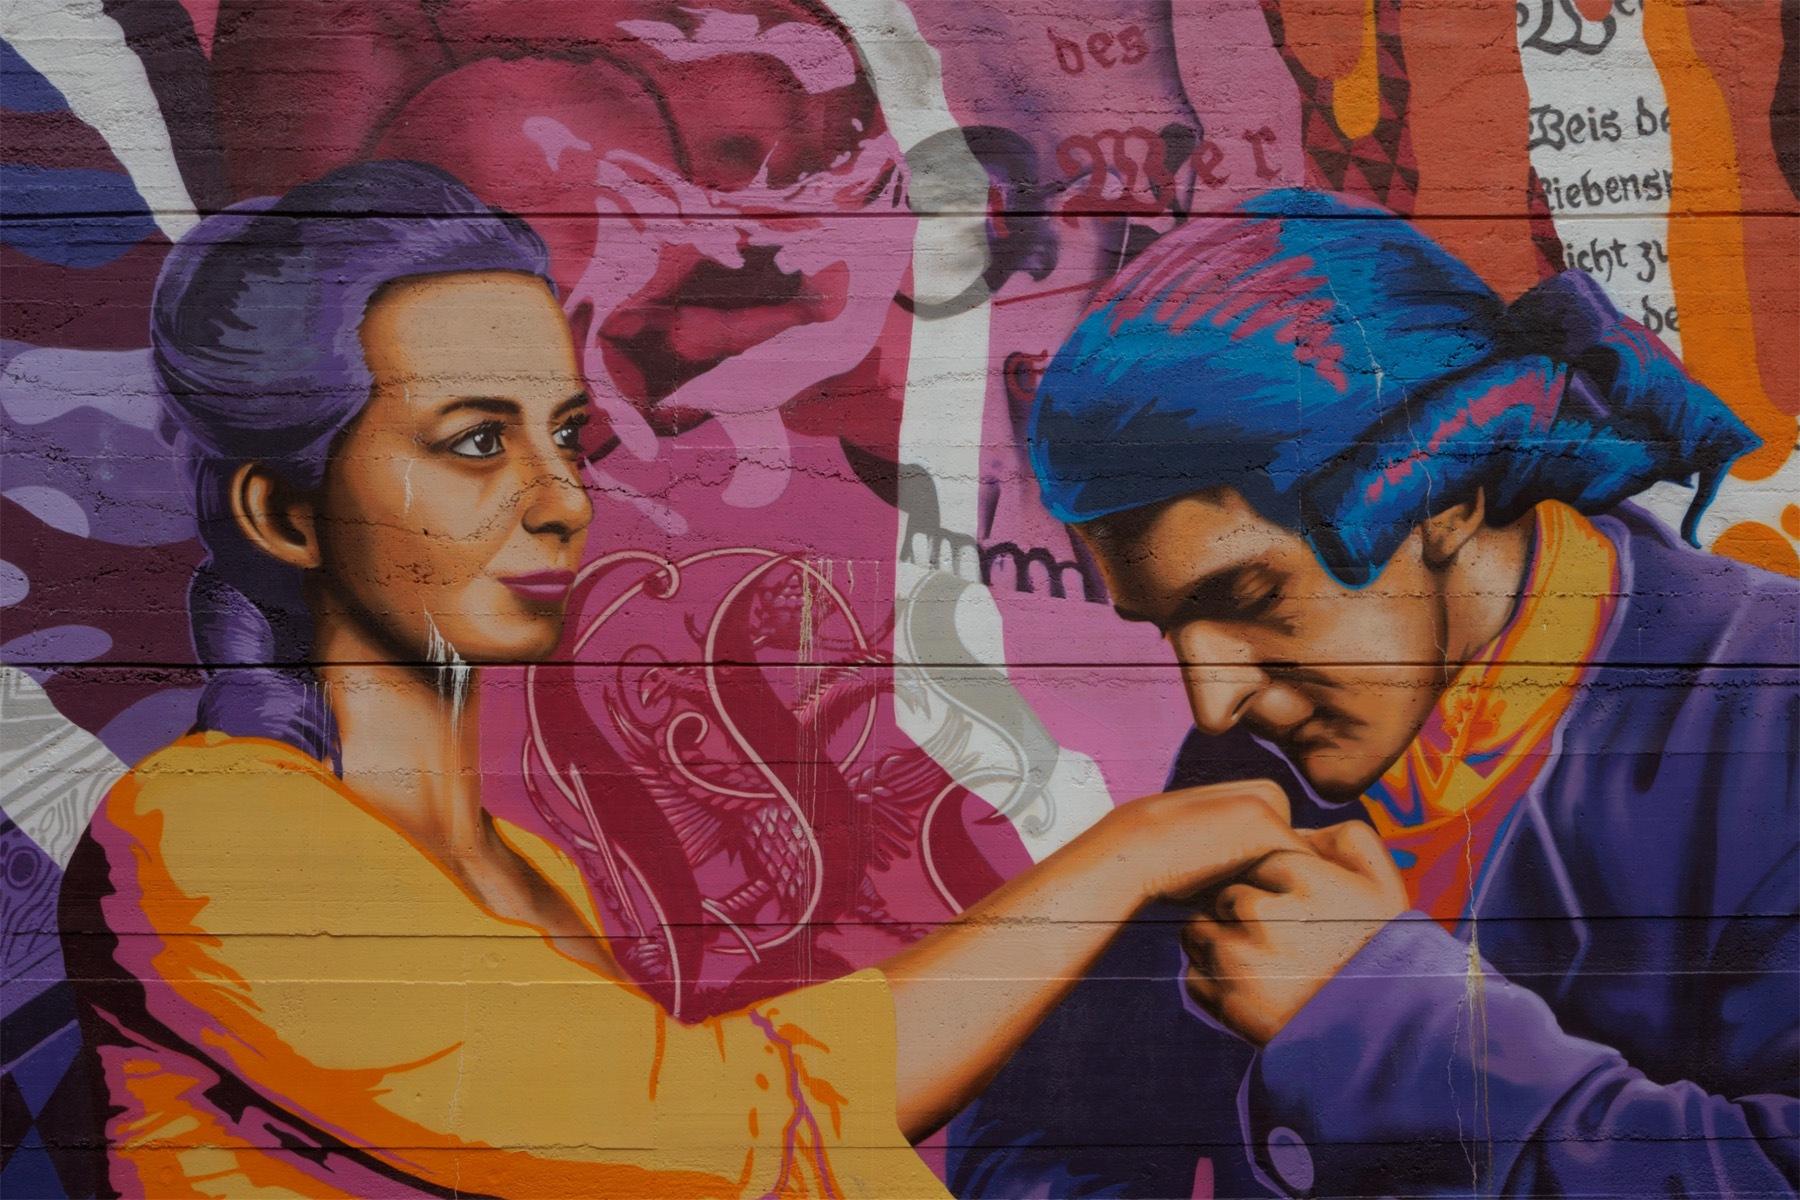 Wetzlar street art by Funktrainer